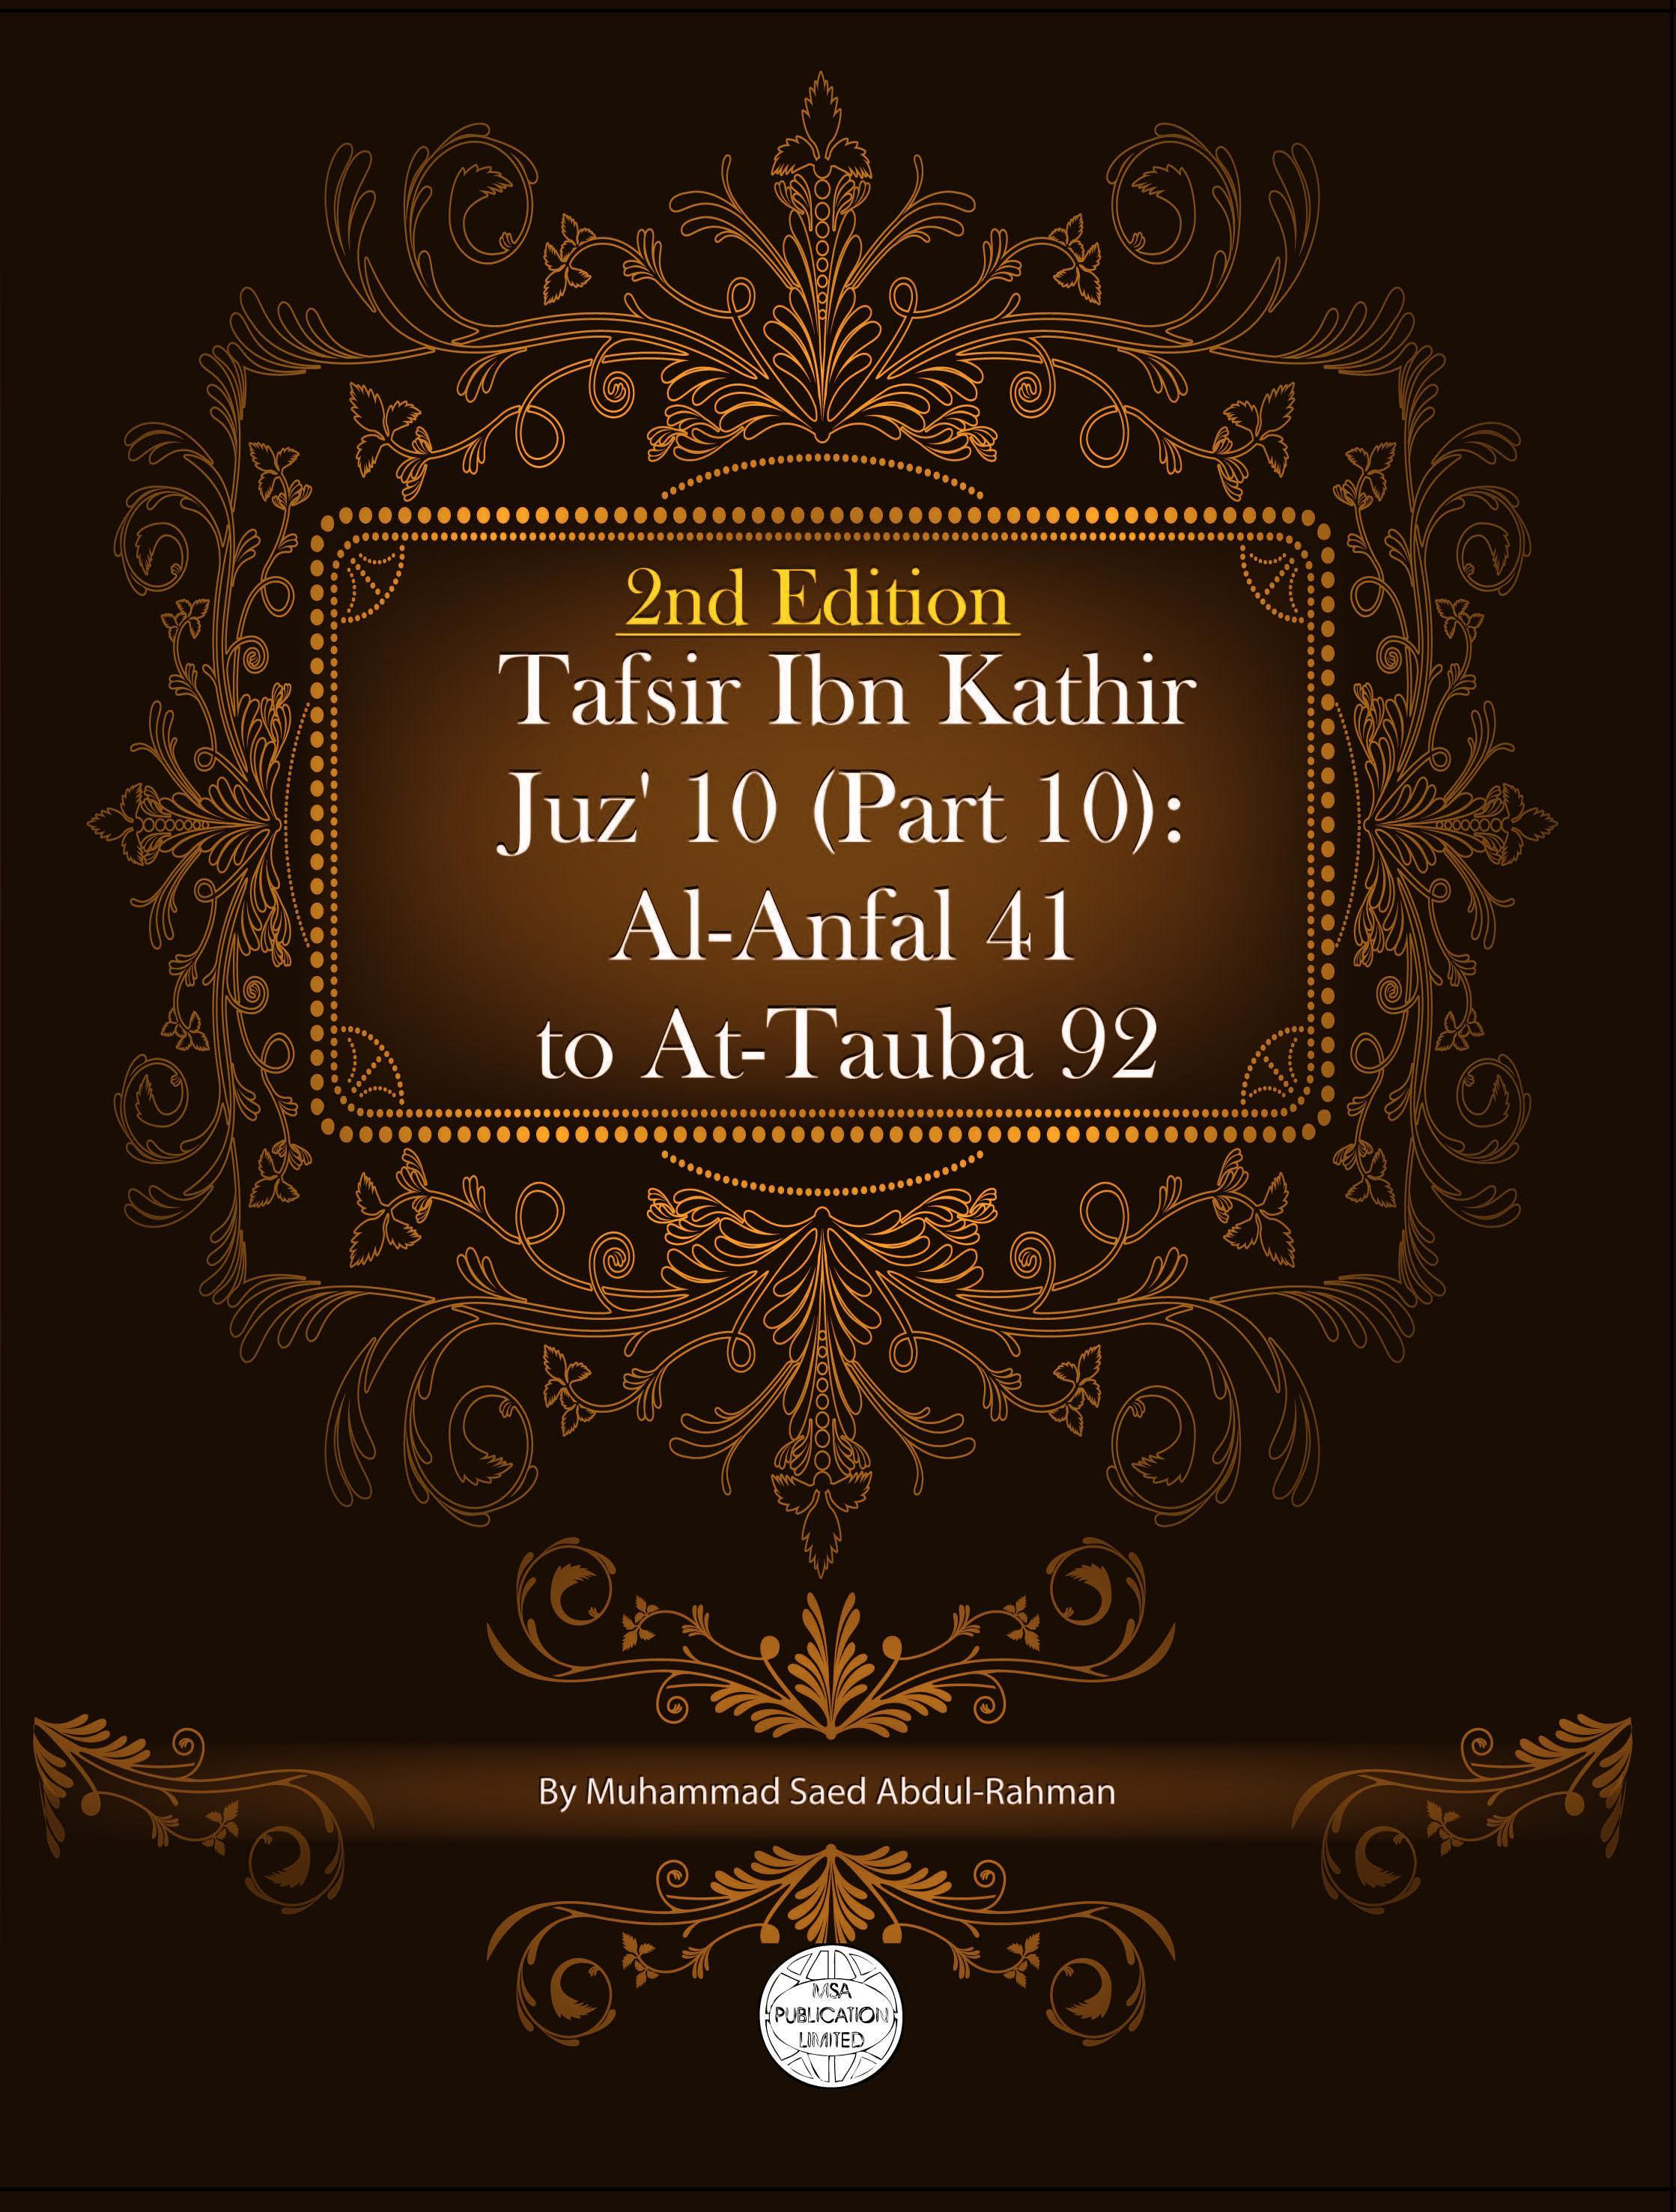 Tafsir Ibn Kathir Juz' 10 (Part 10): Al-Anfal 41 To At-Tauba 92 2nd Edition